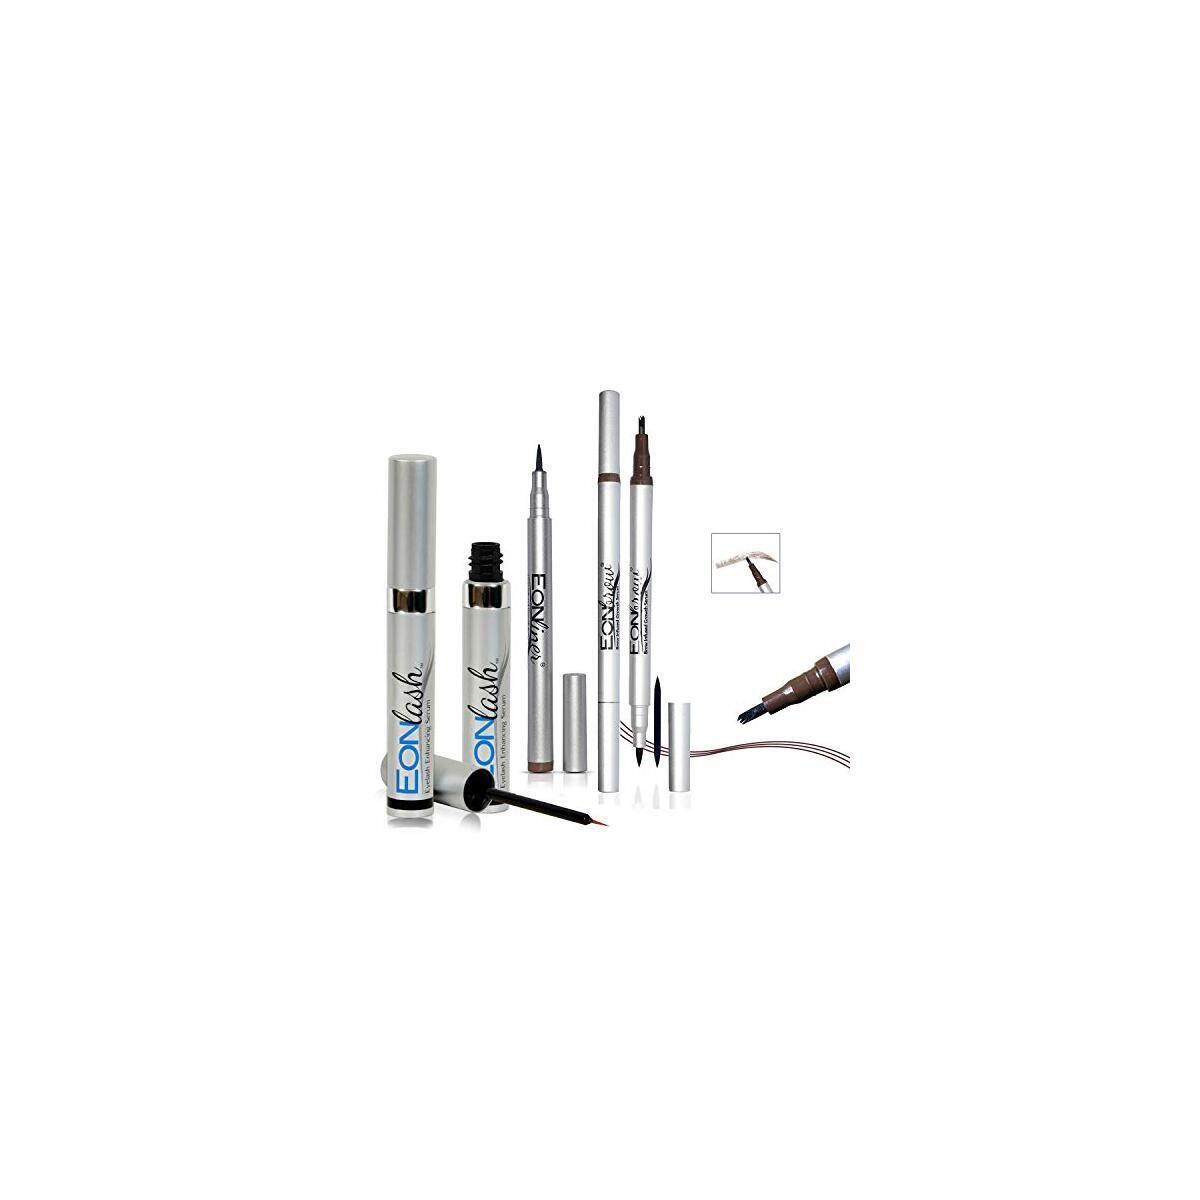 Liquid Eyeliner Pen - Eyebrow Enhancer - Eyelash Growth Serum Long Lasting   Super Slim   Ultra-Fine Felt Tip Liquid Pen Waterproof Smudge Proof Perfect Makeup,Quick Drying Formula -12 Hours Treatment